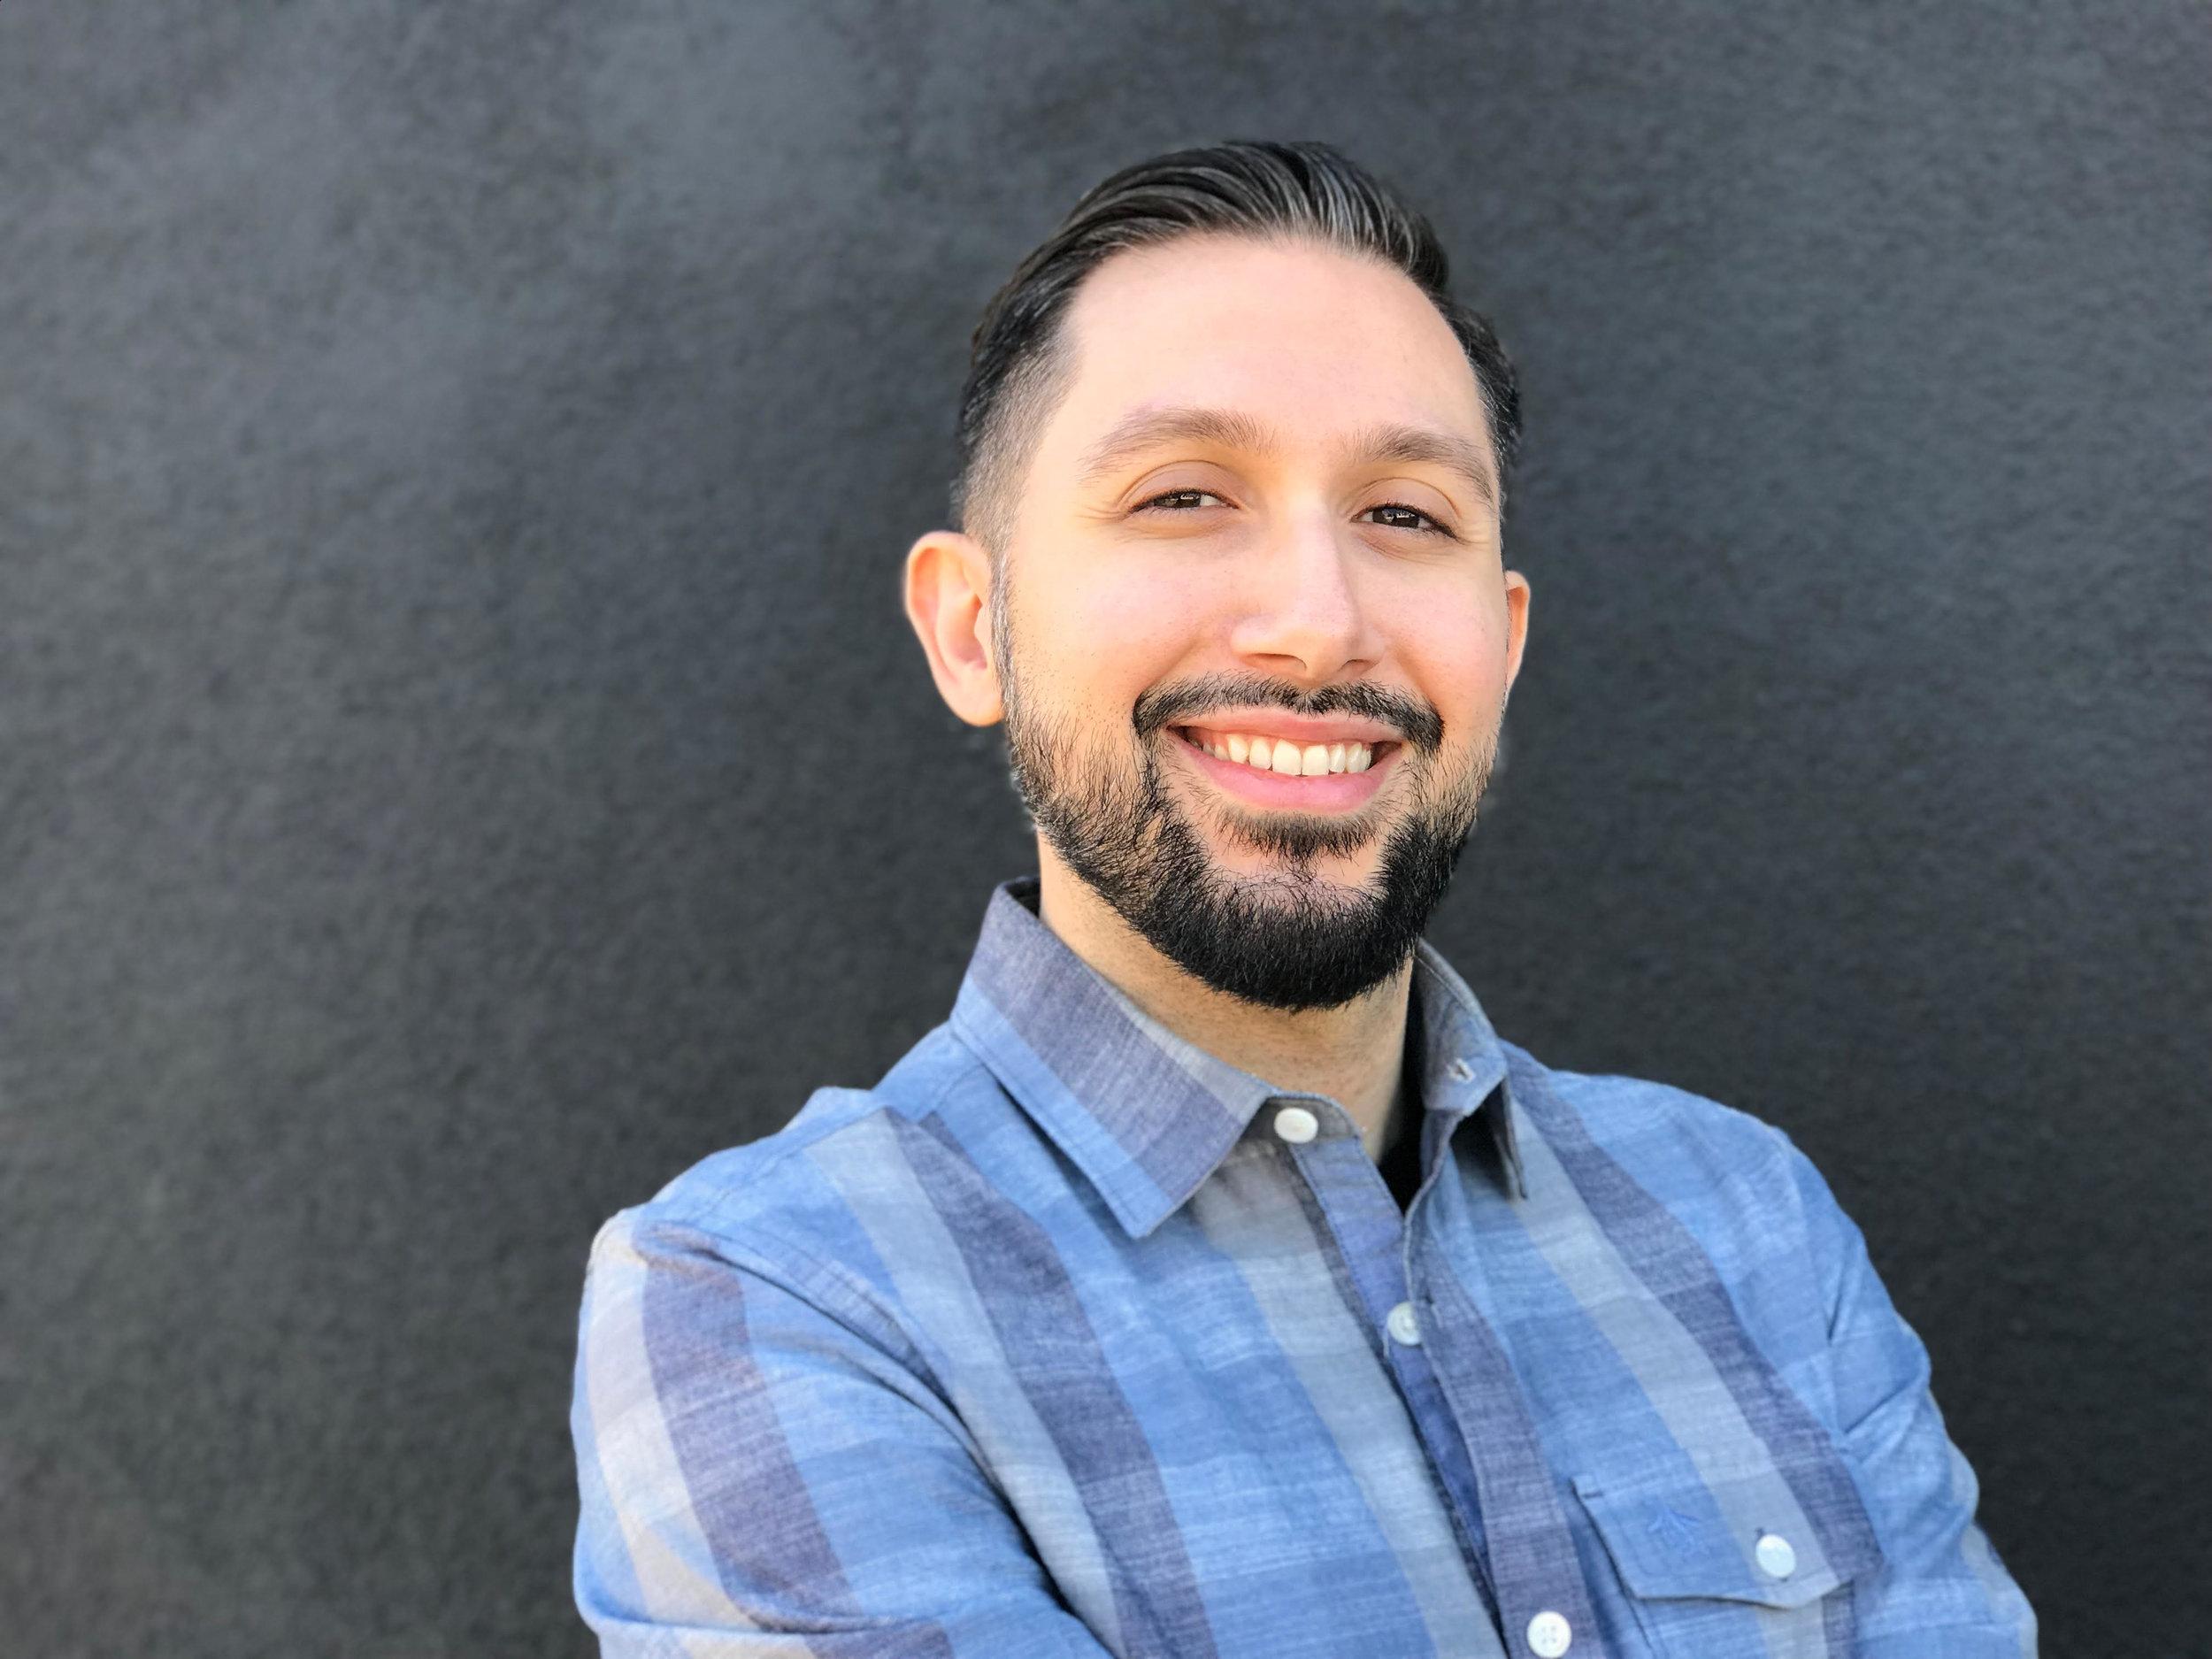 Jacob Boghosian, Art Director and title designer of the Netflix series,  Stranger Things